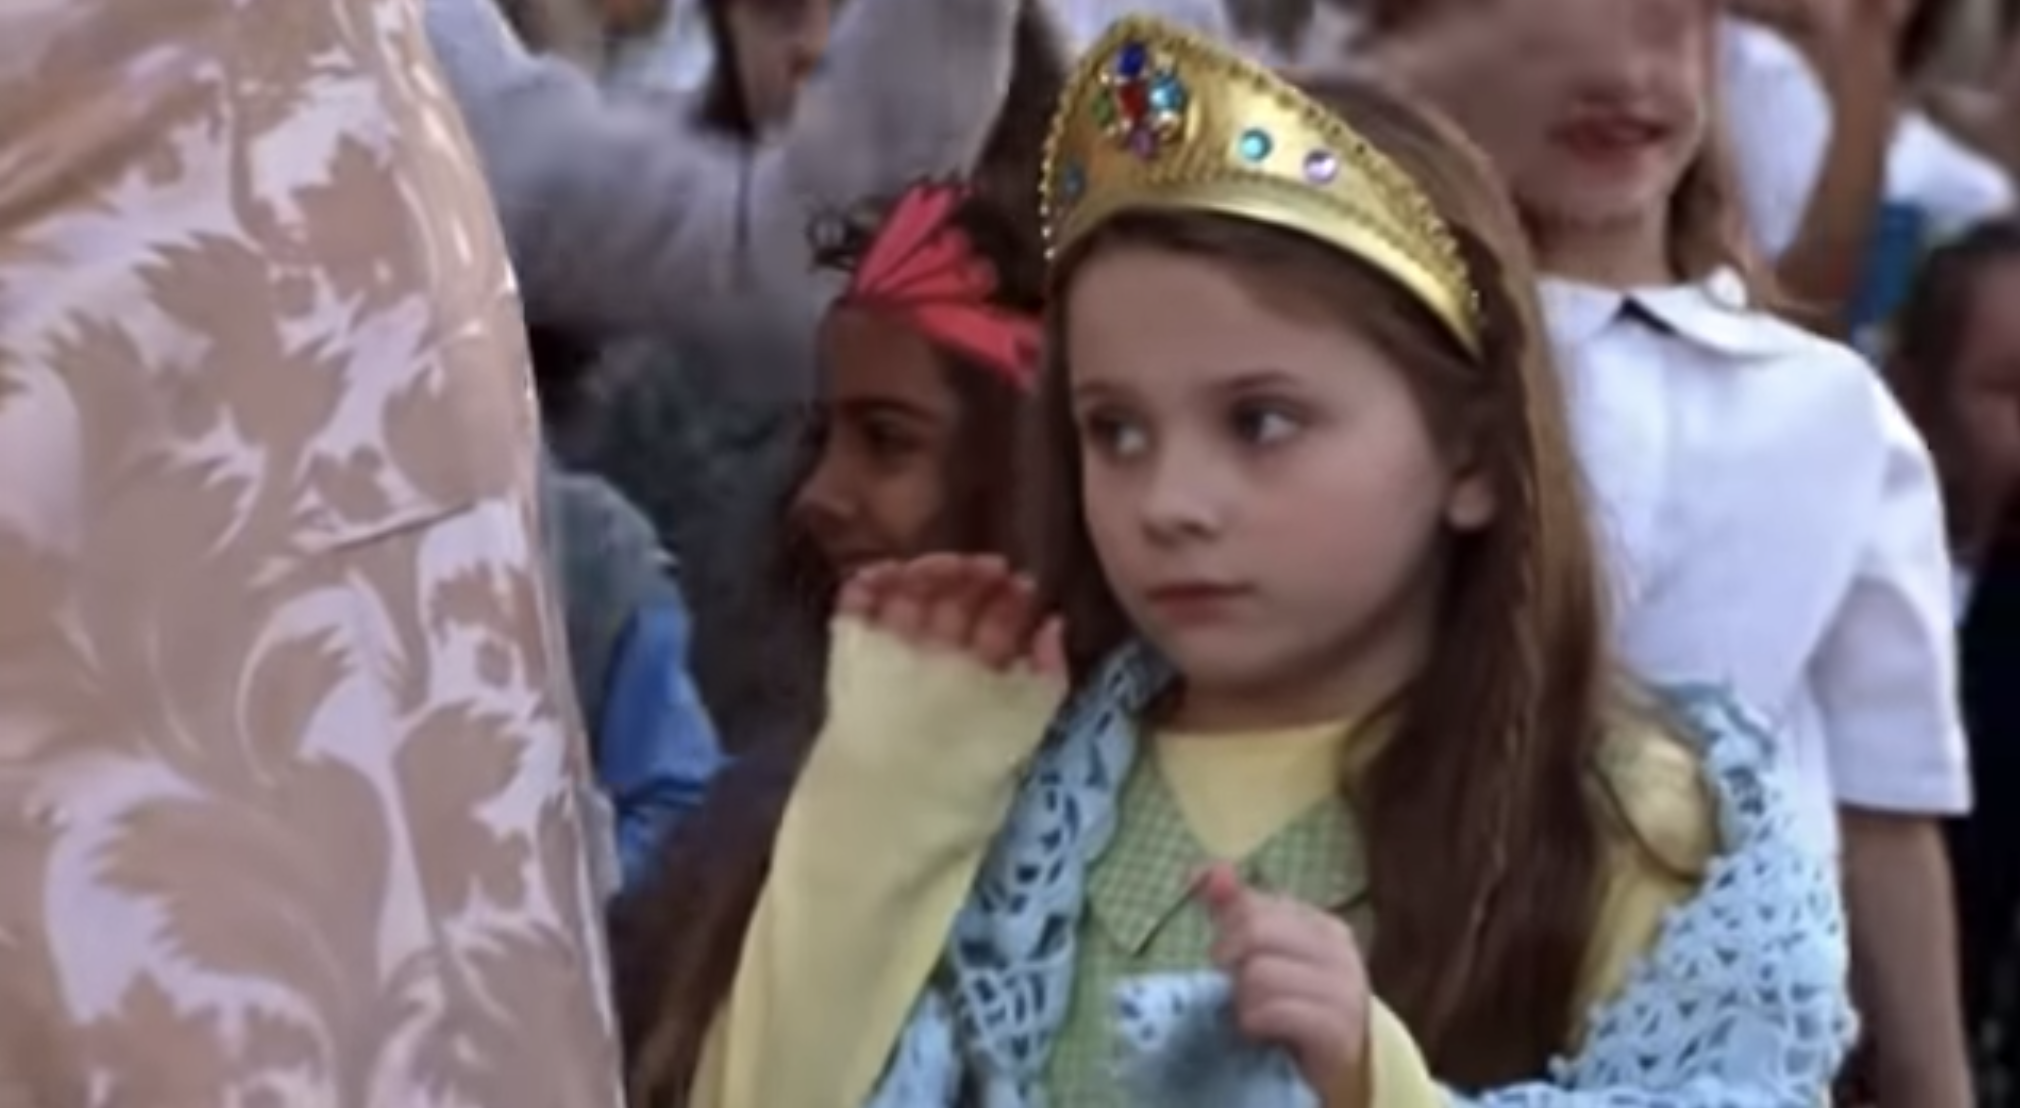 Carolina walking and waving alongside Princess Mia in the Genovian Independence Day parade.